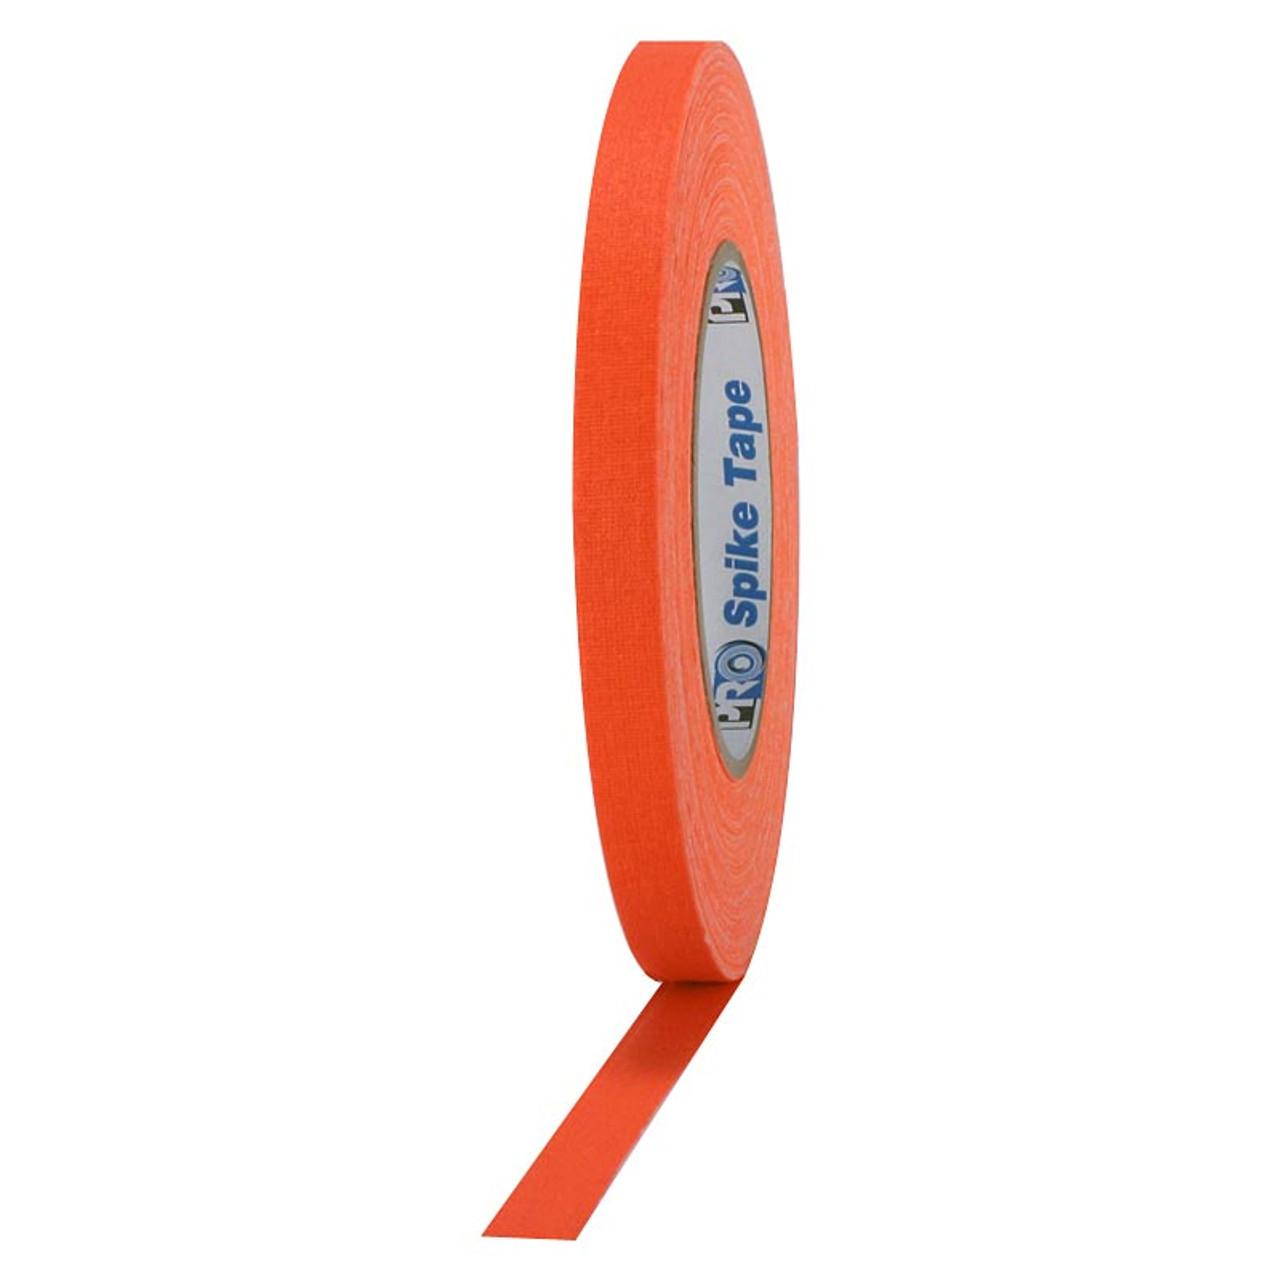 "Spike Tape - FL Orange 1"" x 50 Yds"